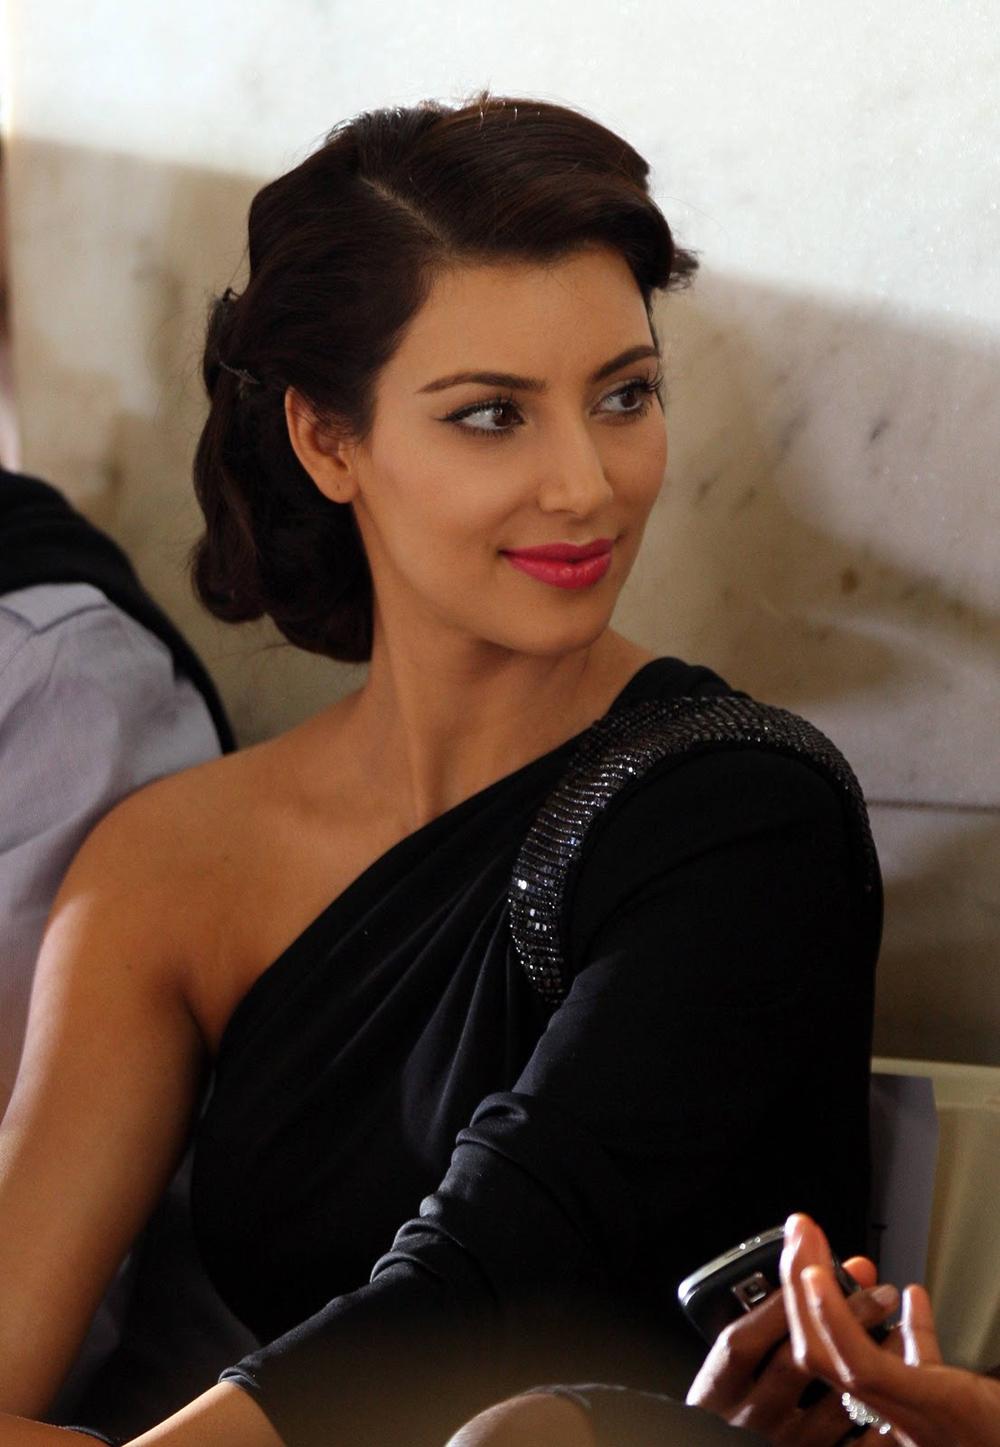 Kim Kardashian Updo Hairstyles 02